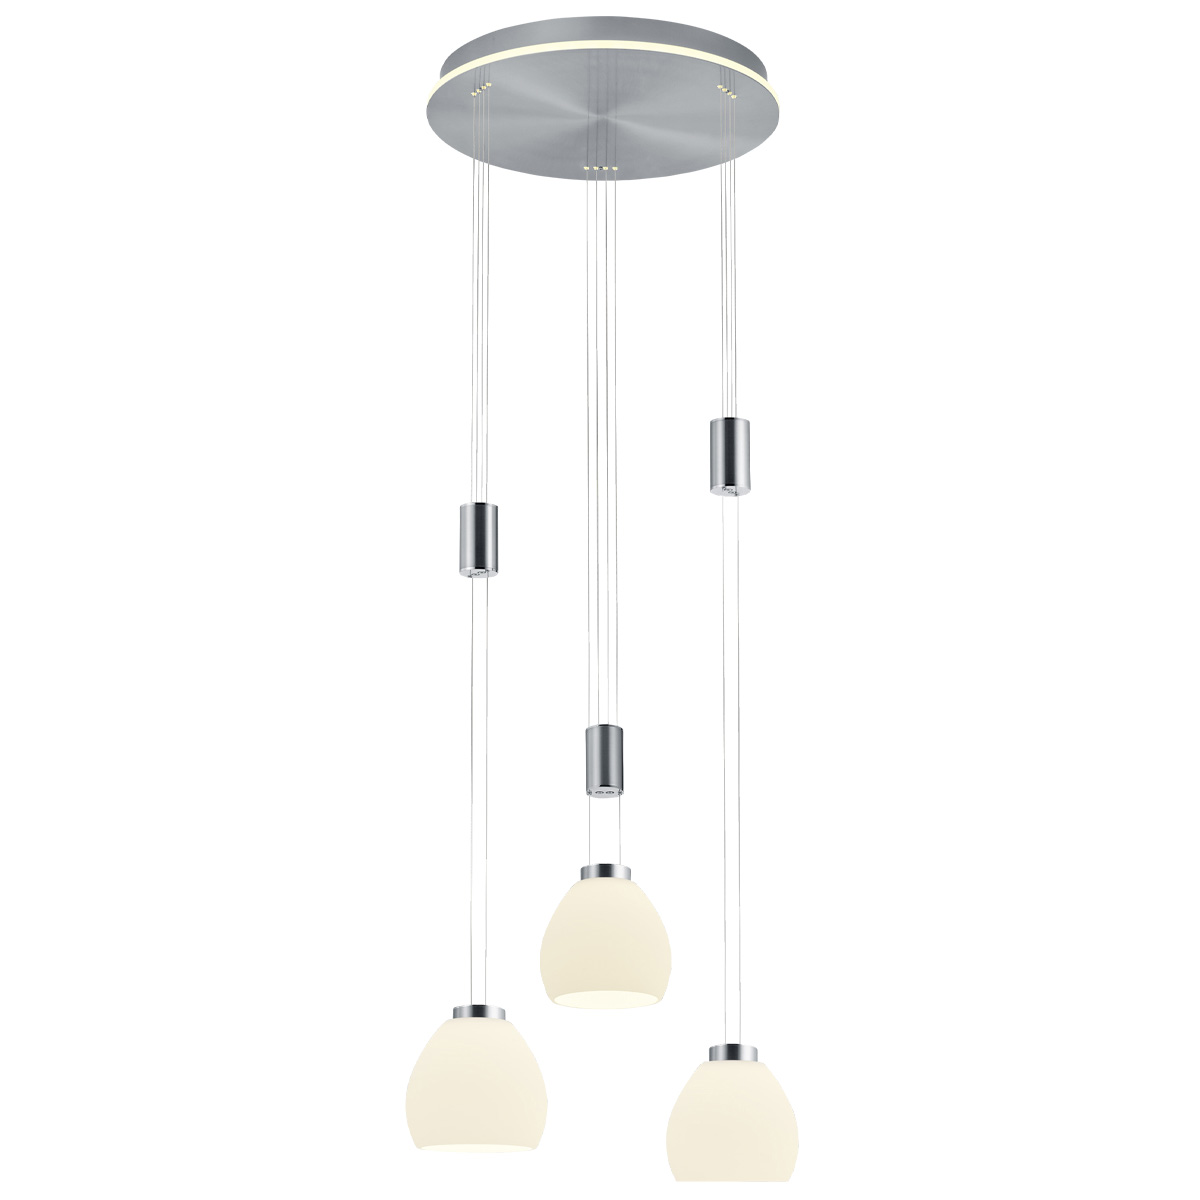 B-Leuchten Sam LED Pendelleuchte, 3-flg., mit Rondell 20454/3-92